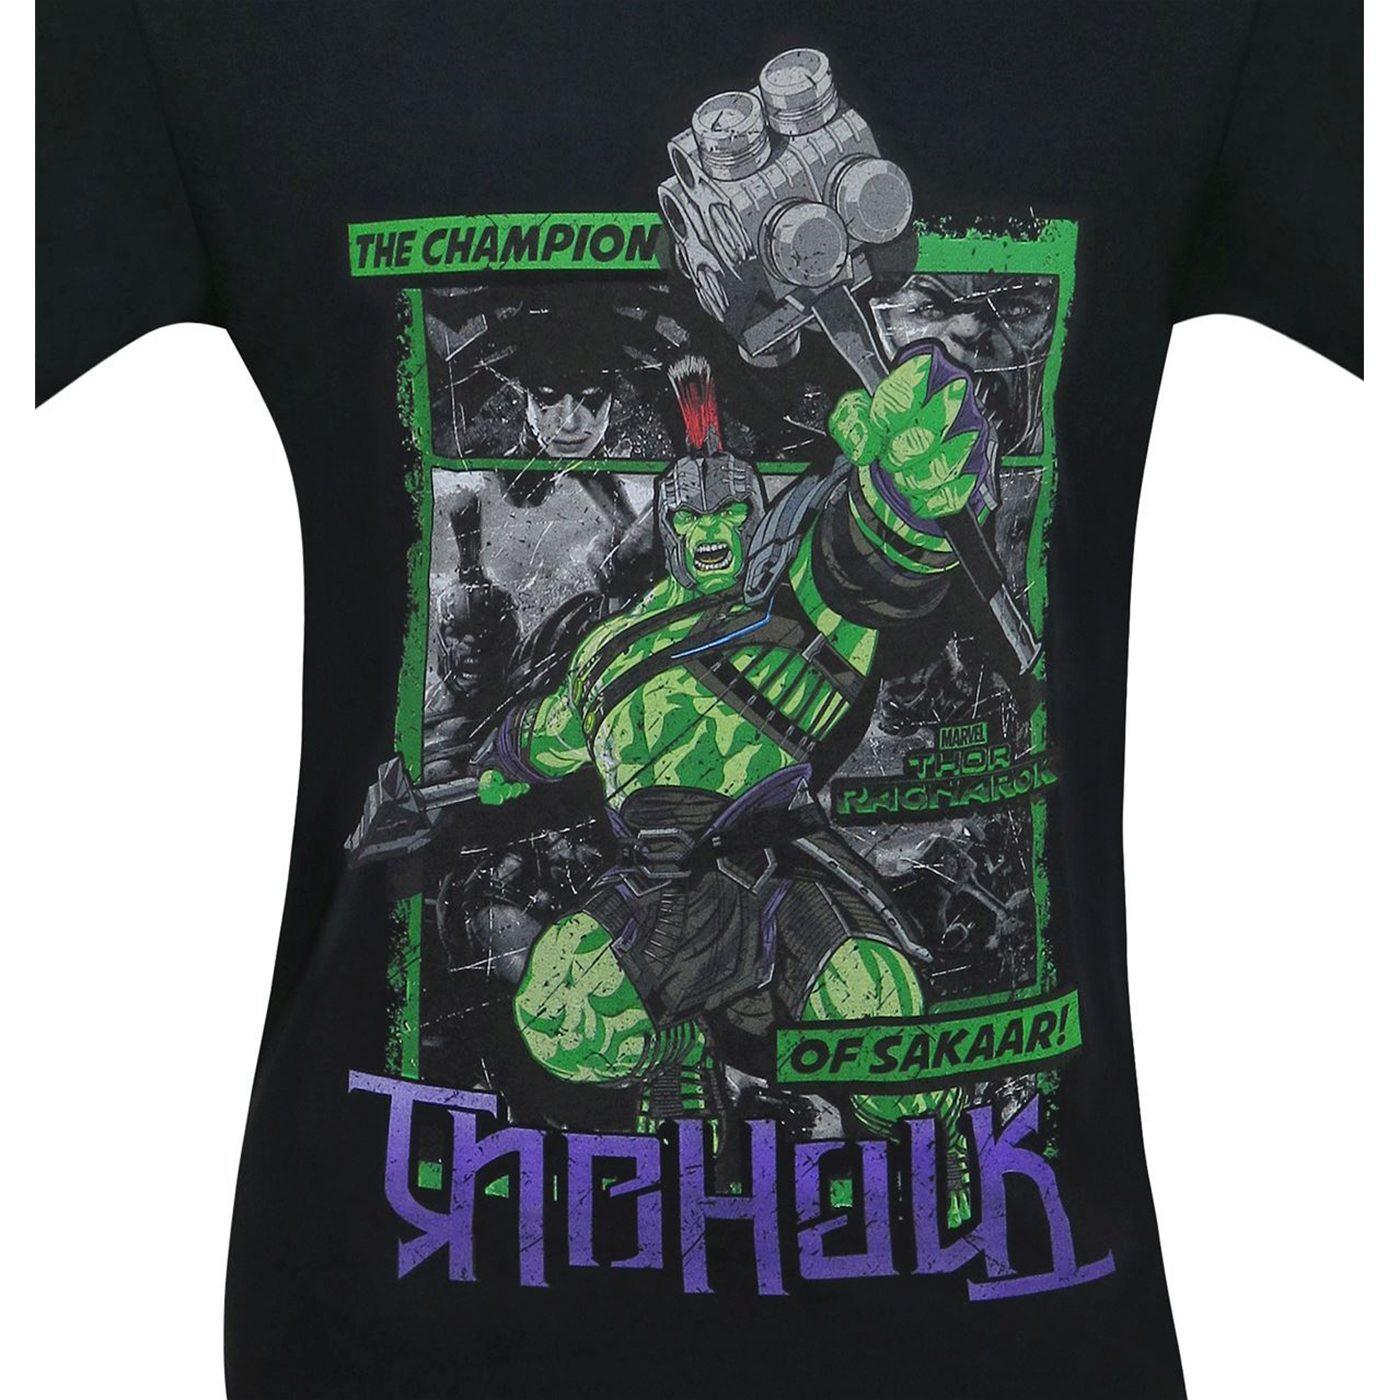 Hulk Thor Ragnarok Ambigram Men's T-Shirt